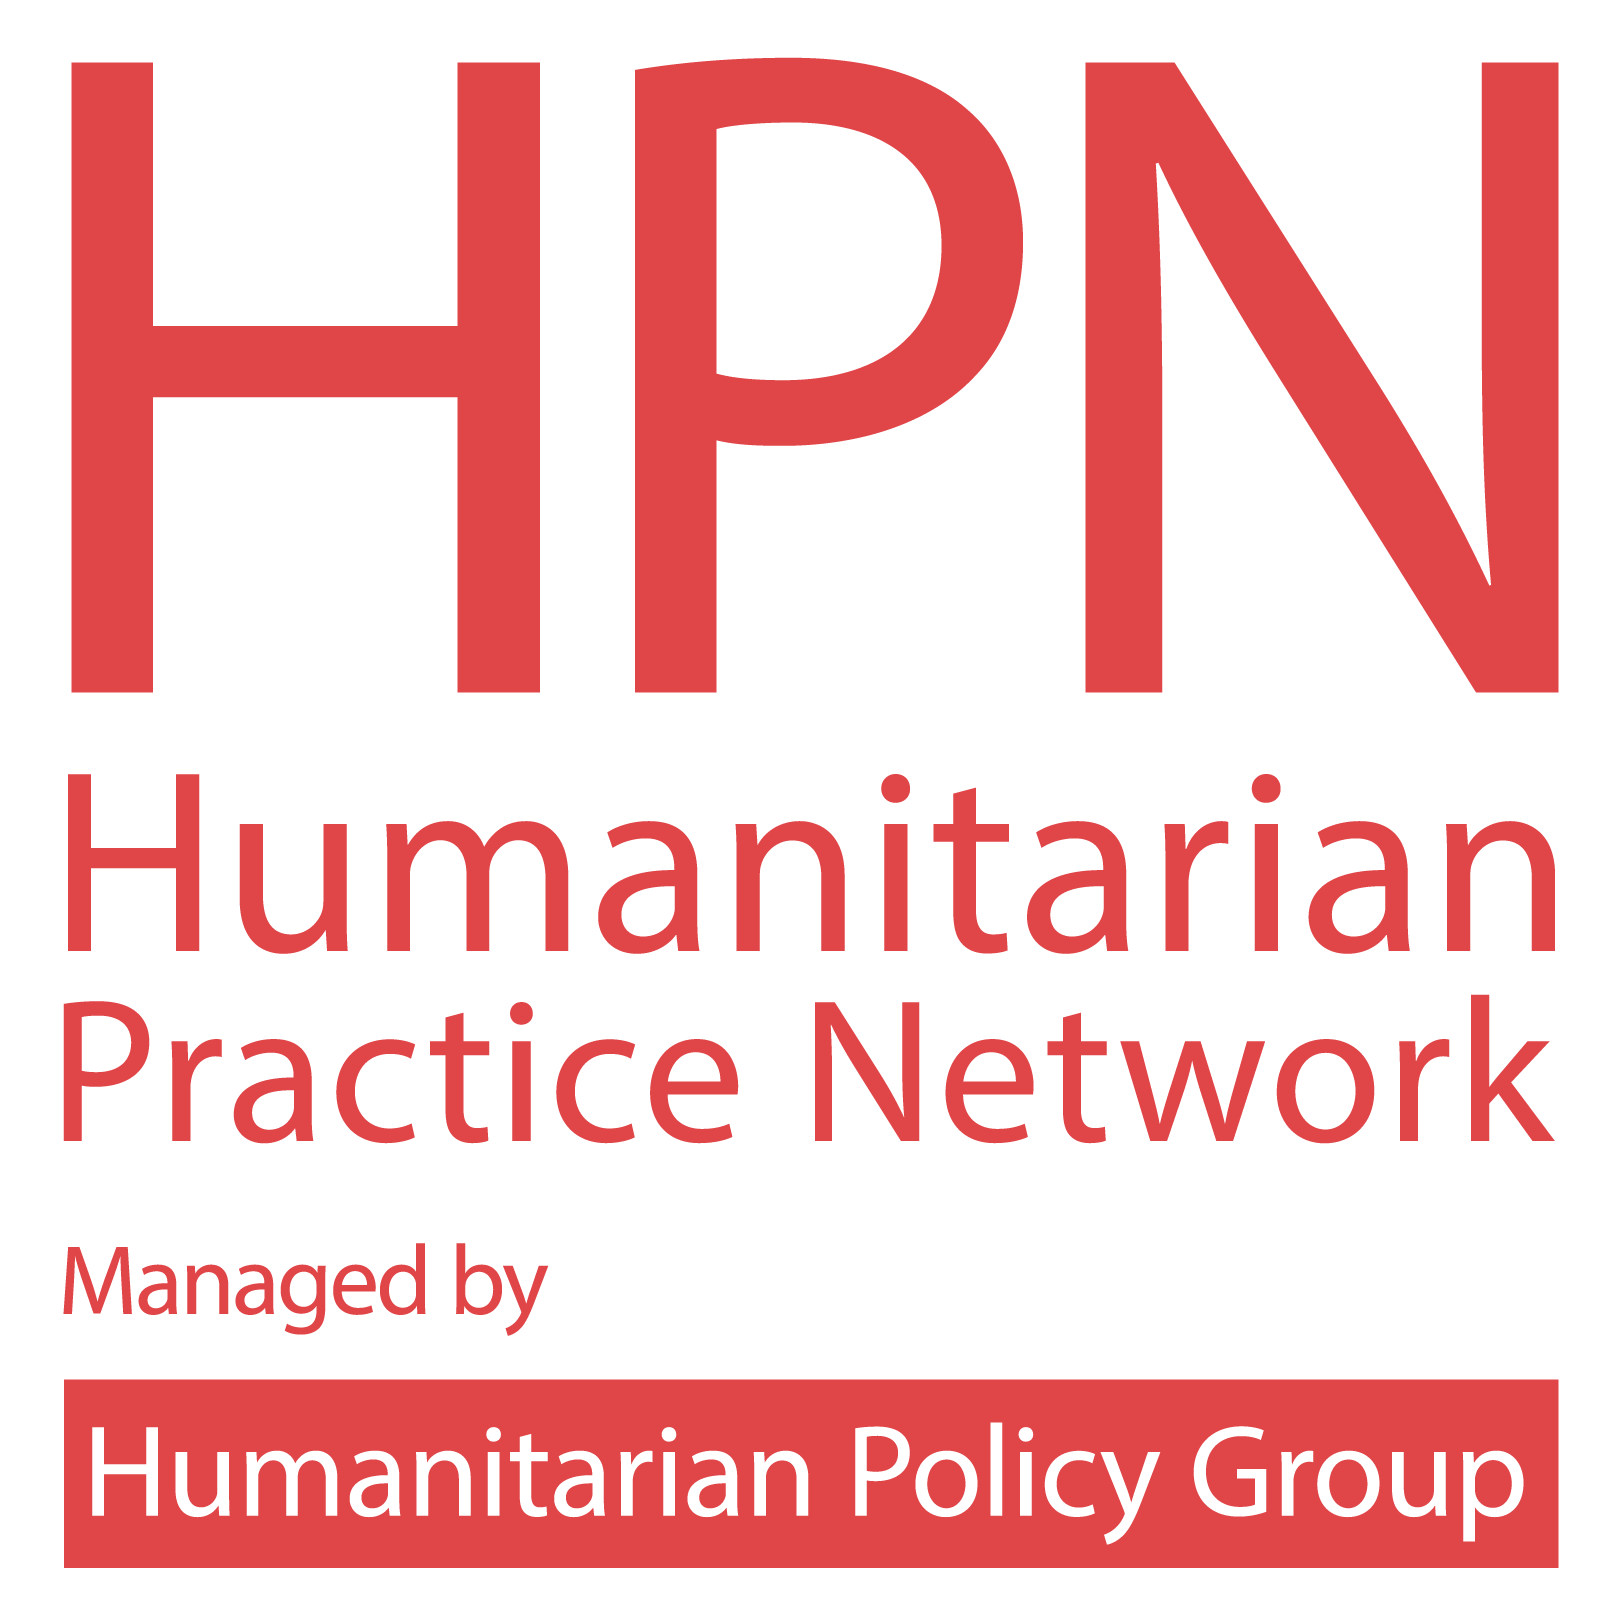 Humanitarian Practice Network